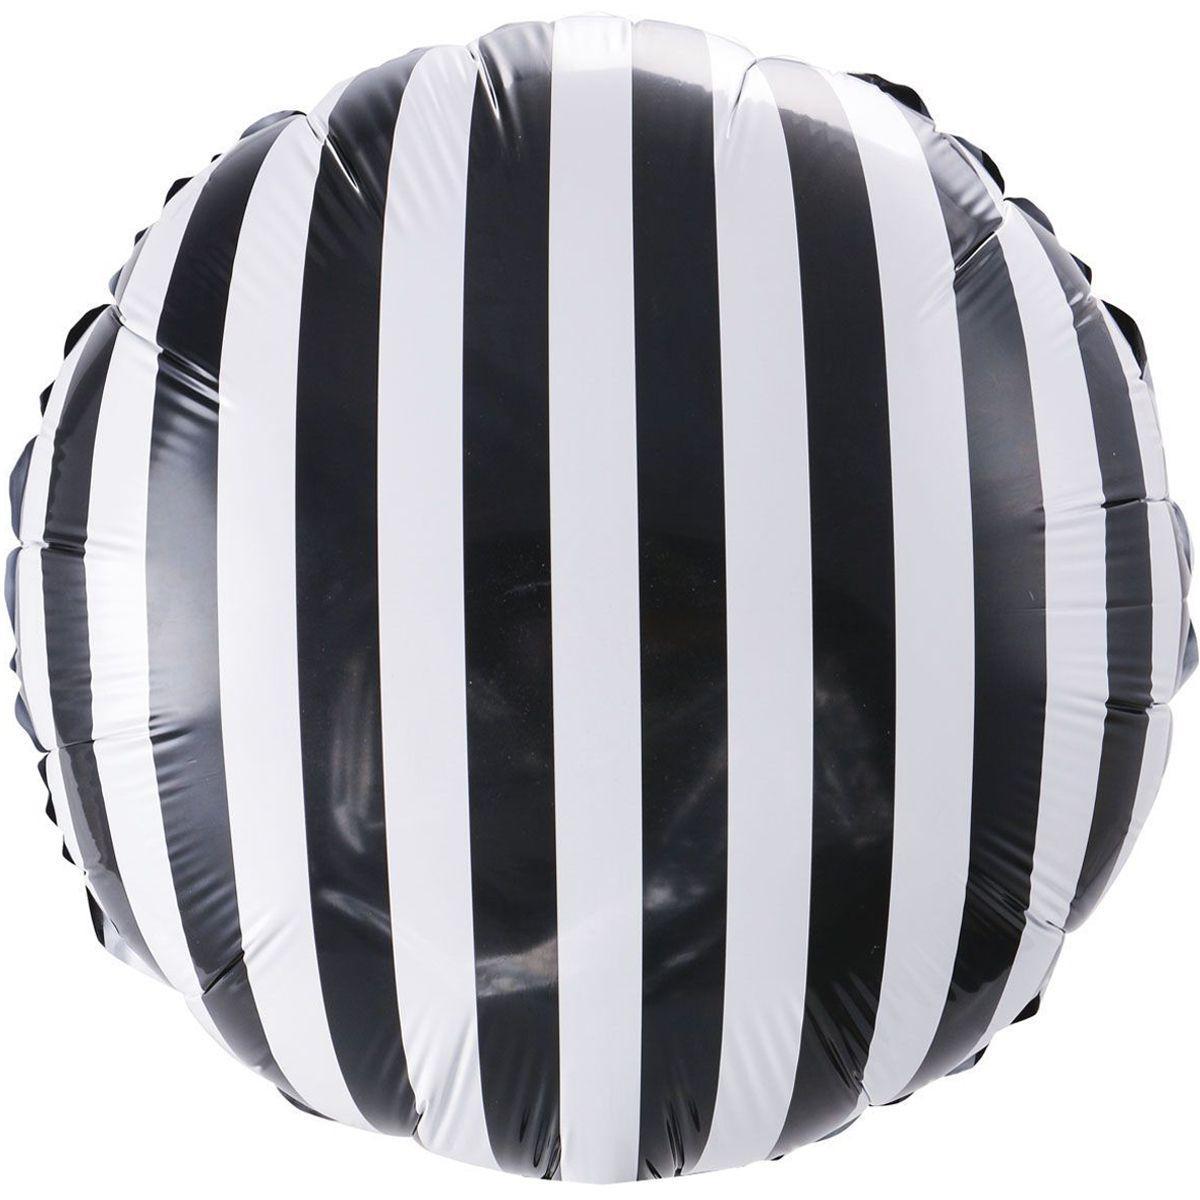 "Фольгована кулька в полоску чорно біле коло 18"" Китай"